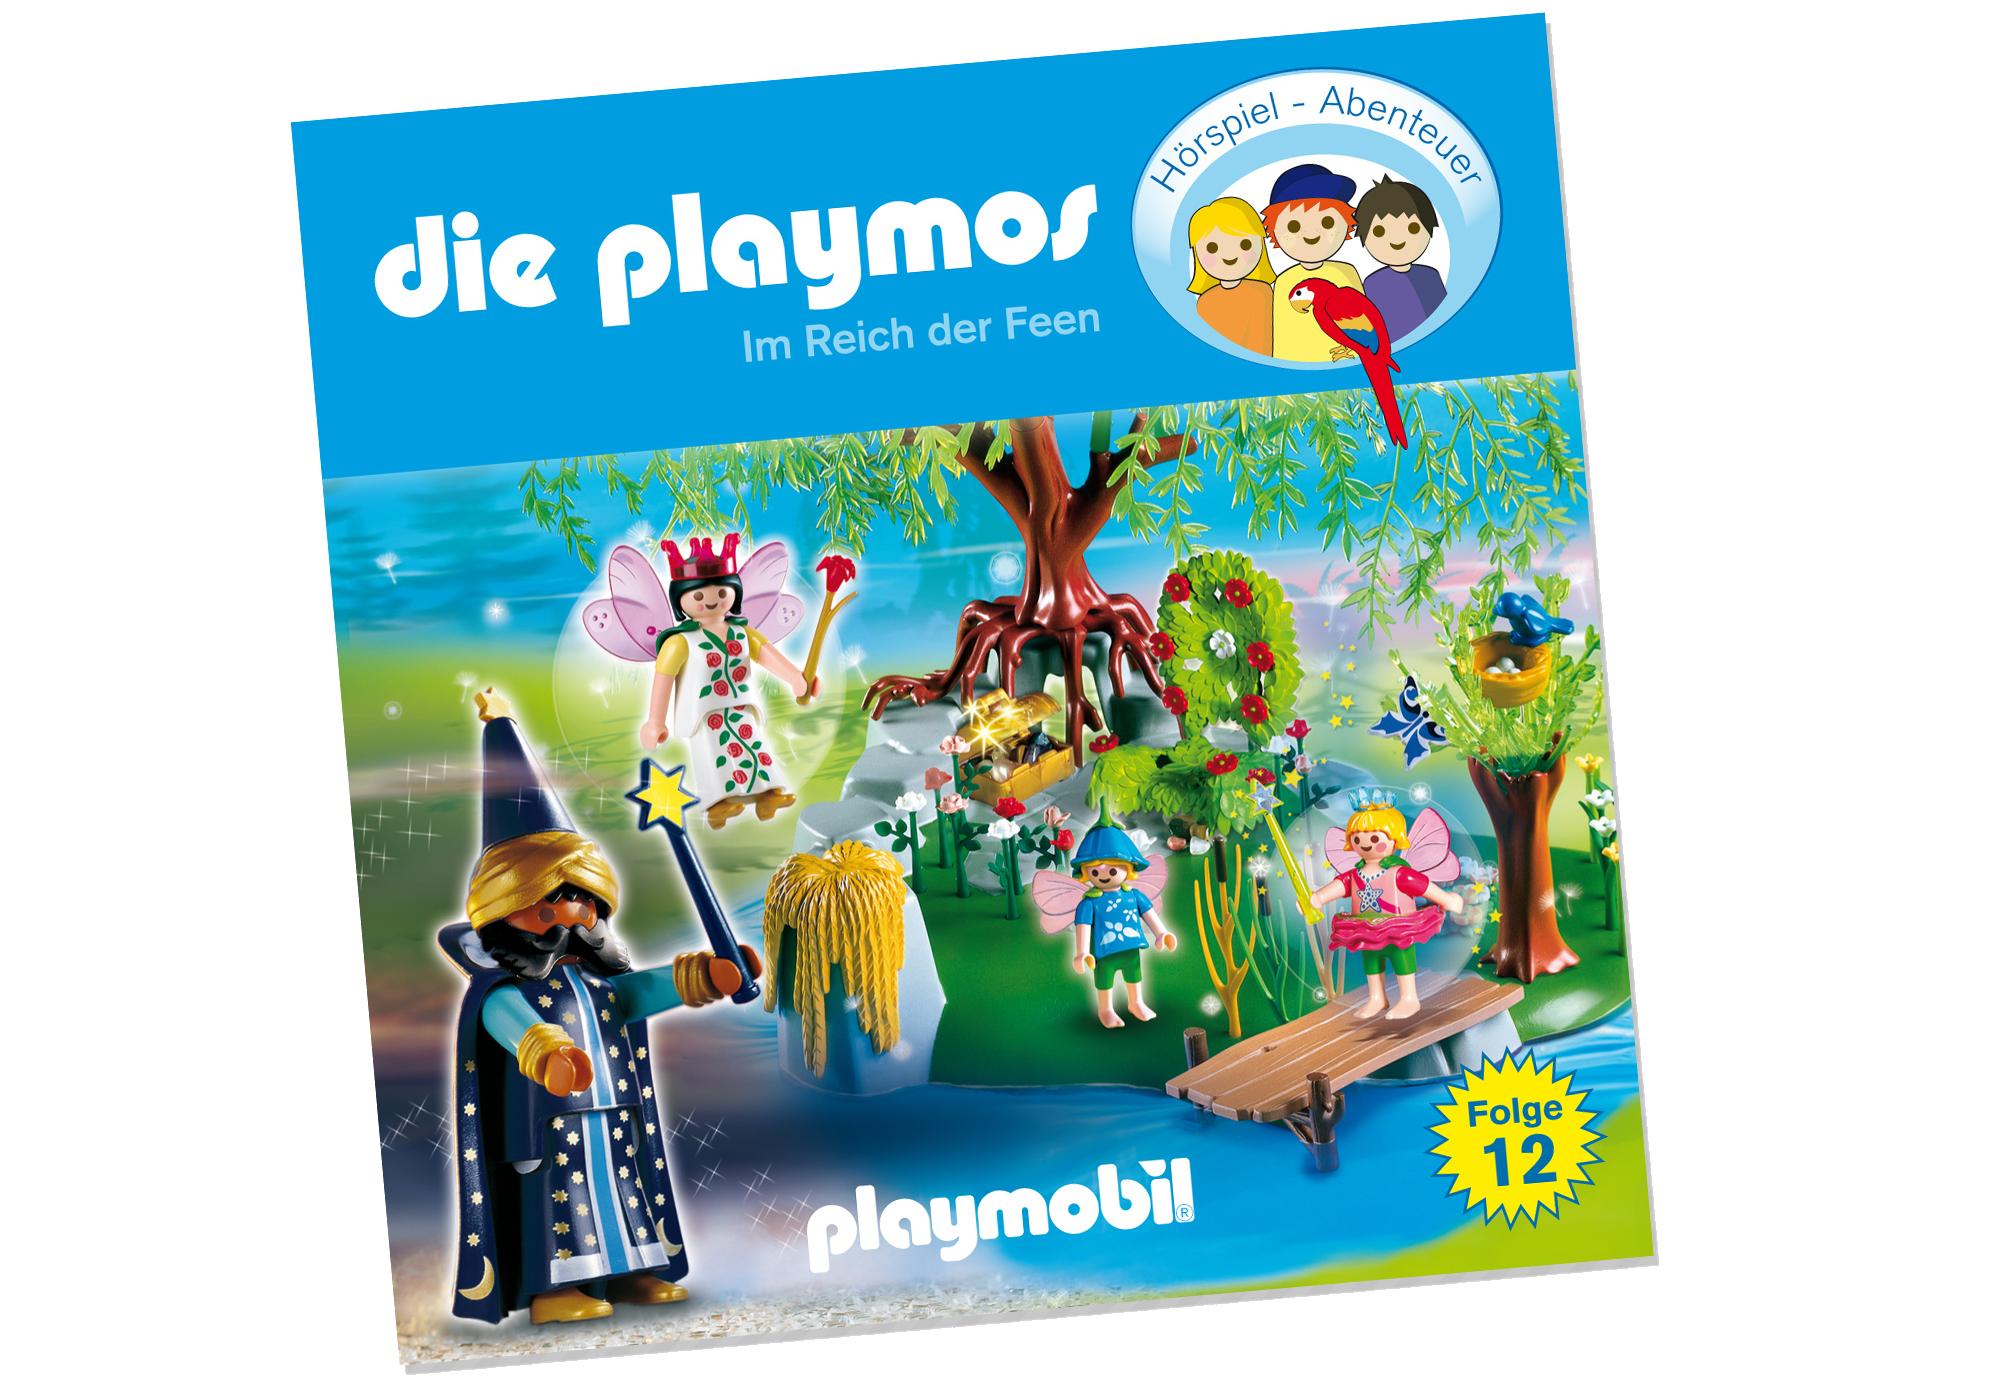 http://media.playmobil.com/i/playmobil/80200_product_detail